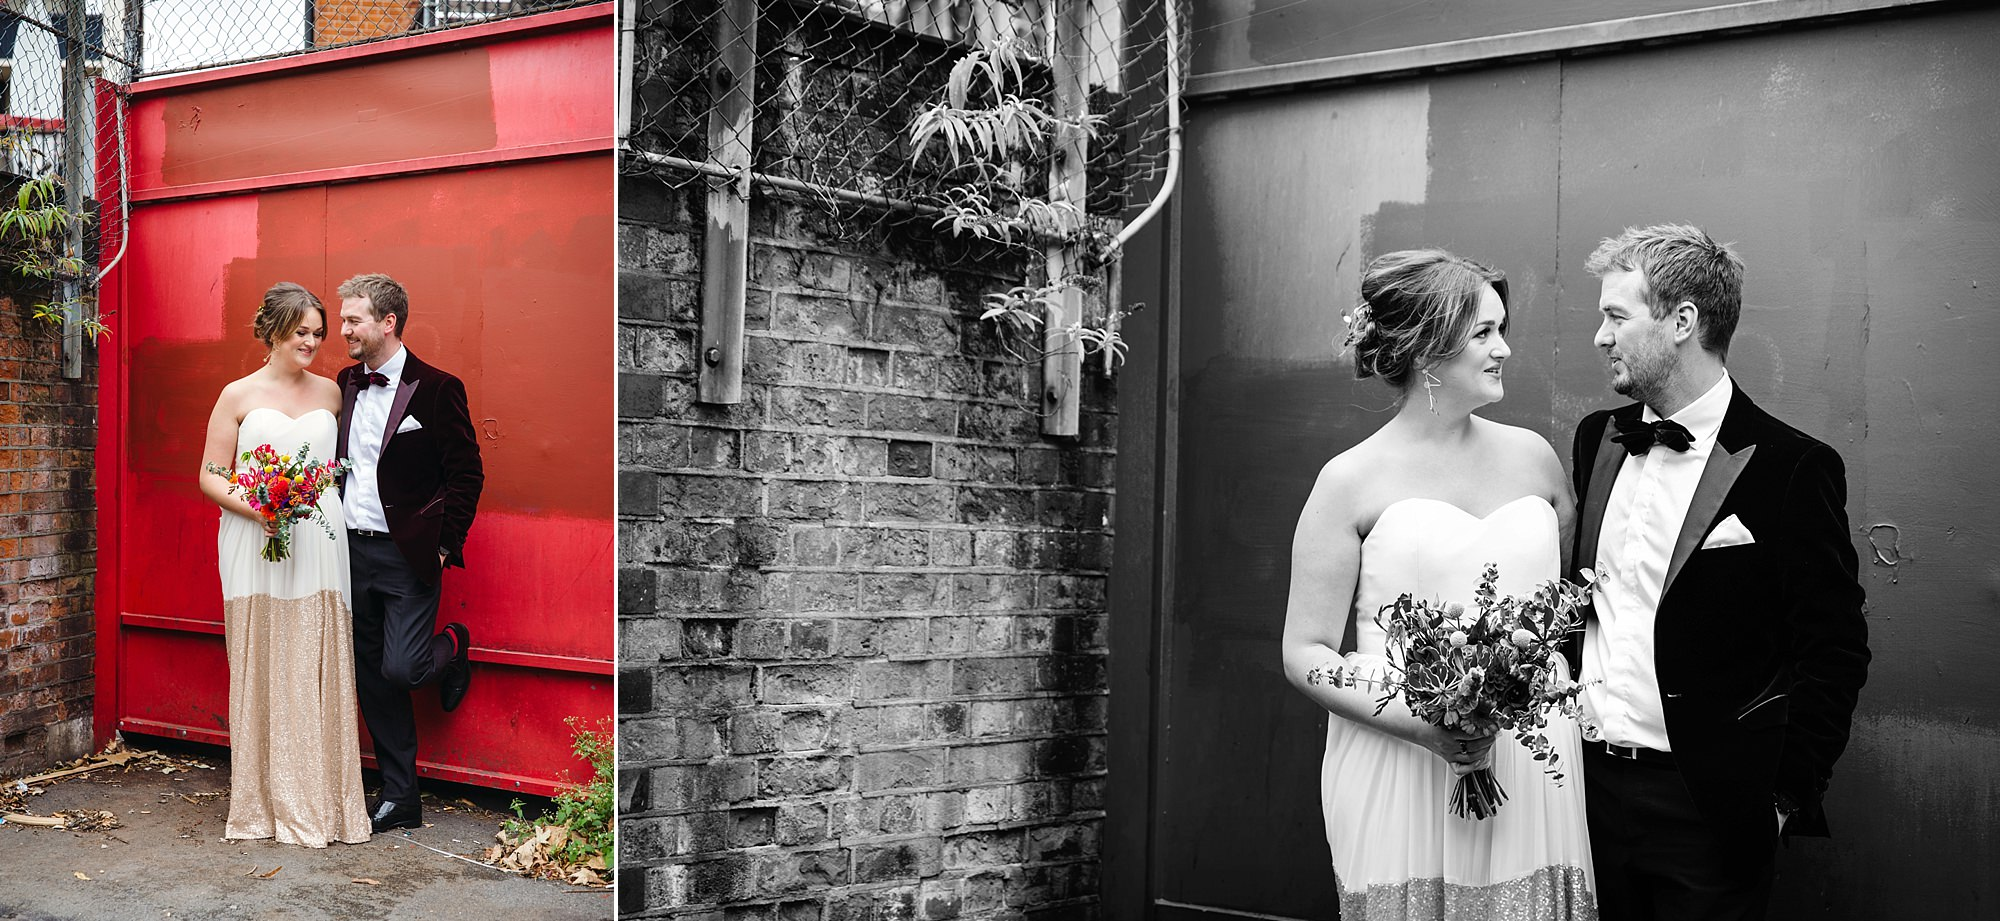 Fun London Wedding bride and groom urban portrait